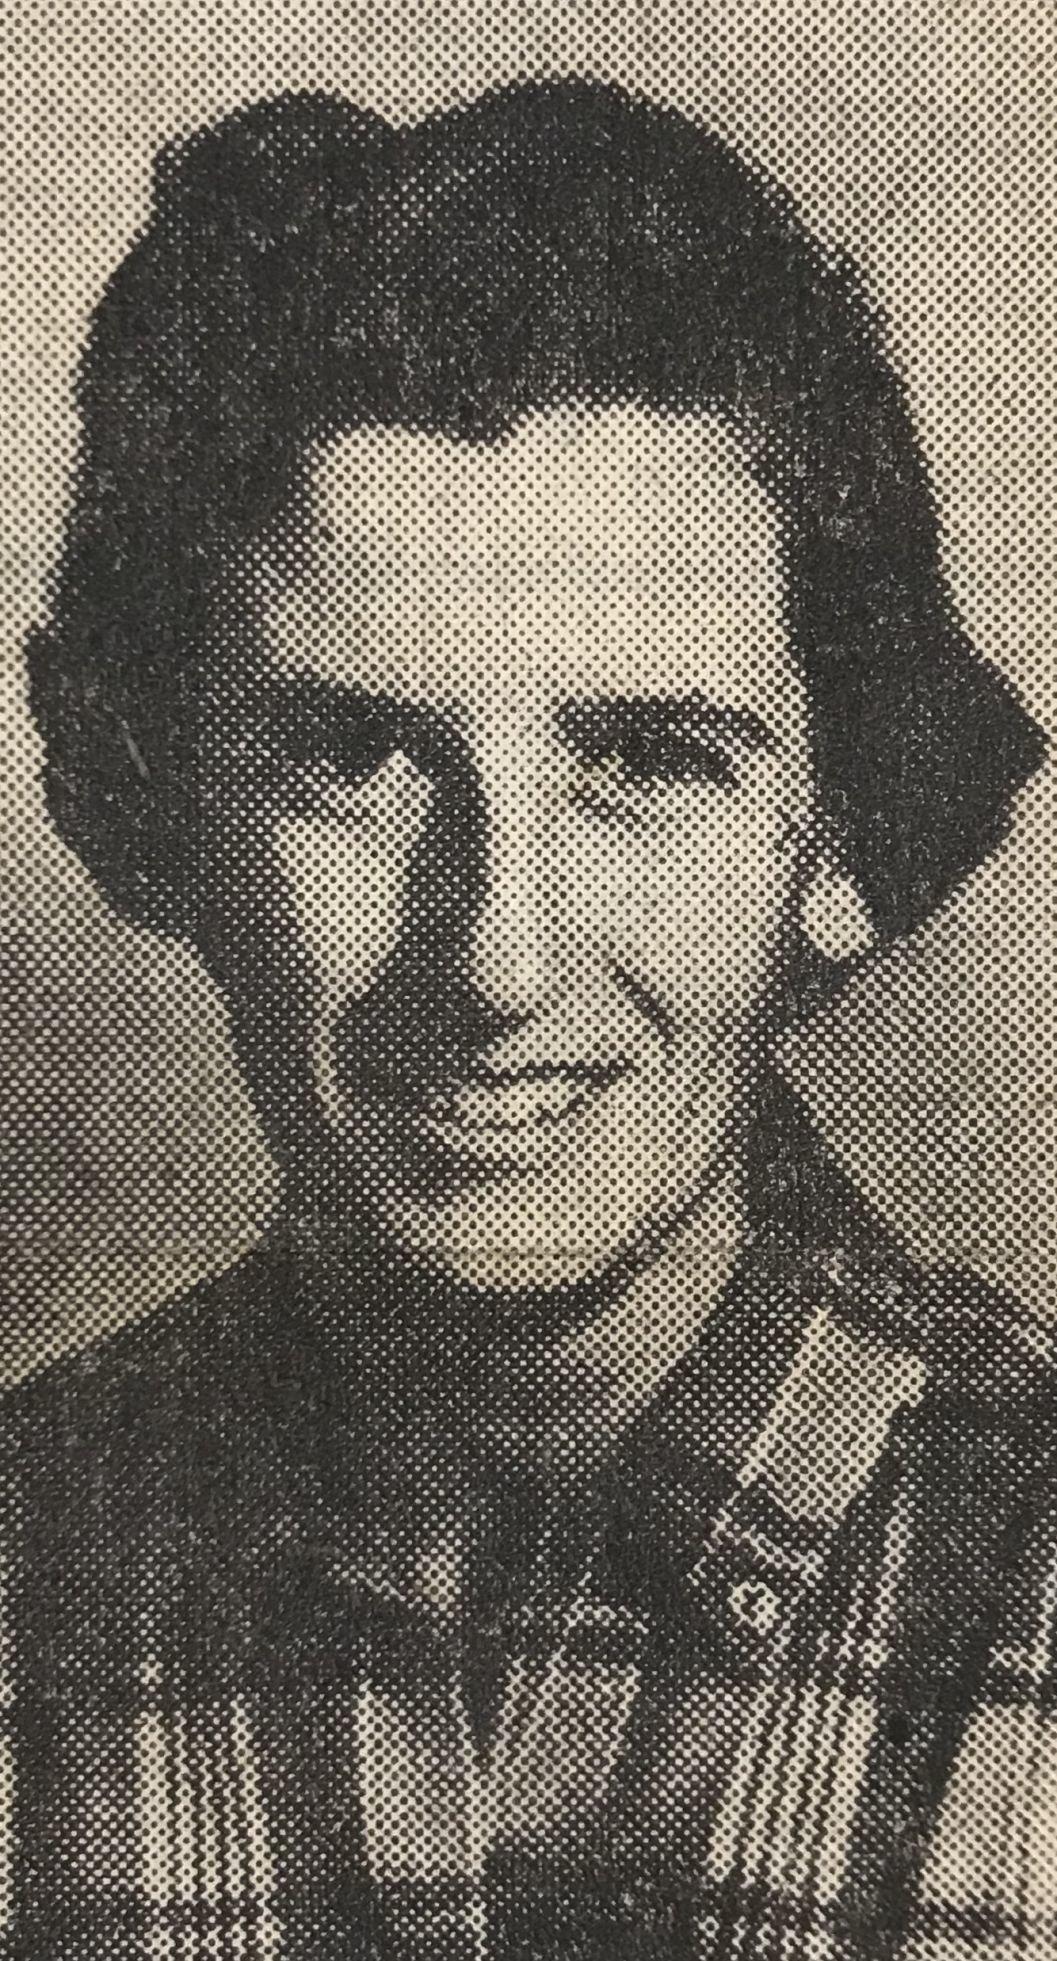 Jeane Bentley (1966)